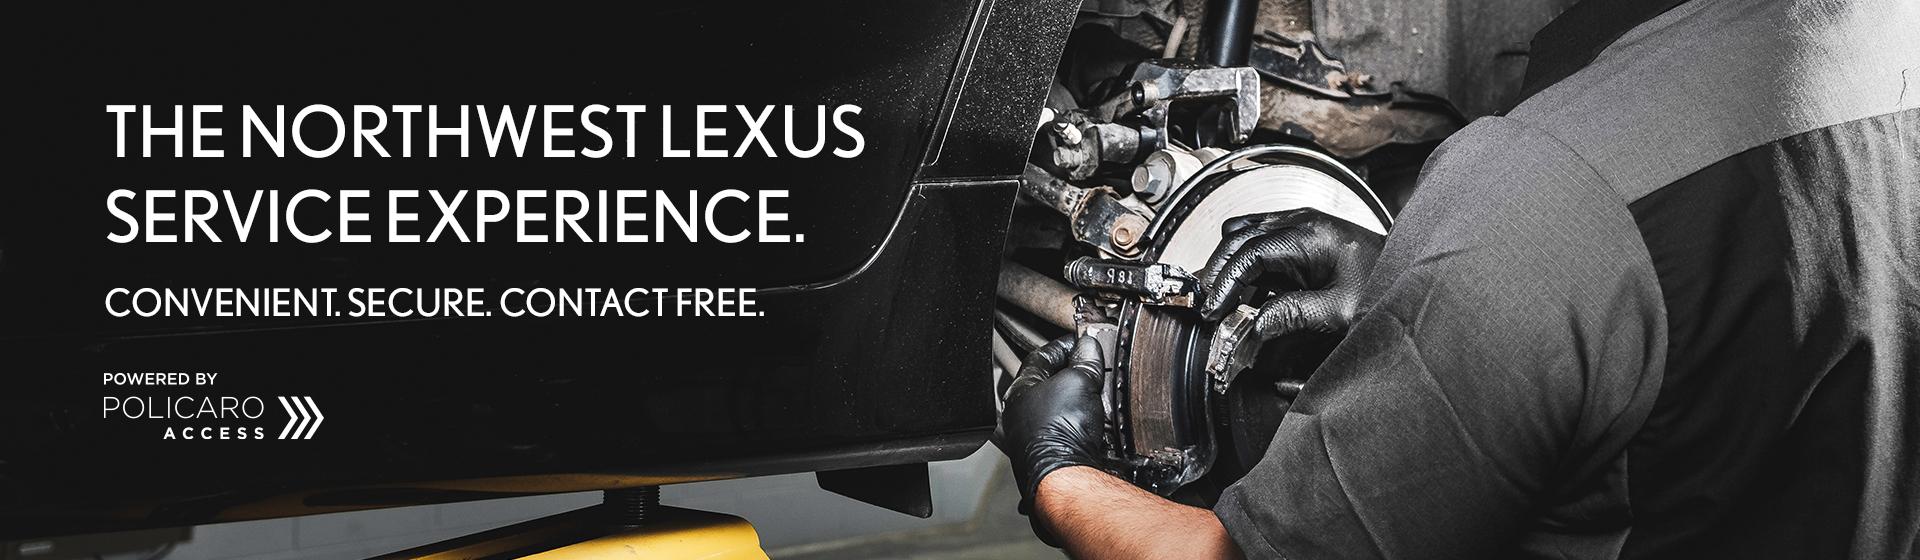 Northwest Lexus Service Experience